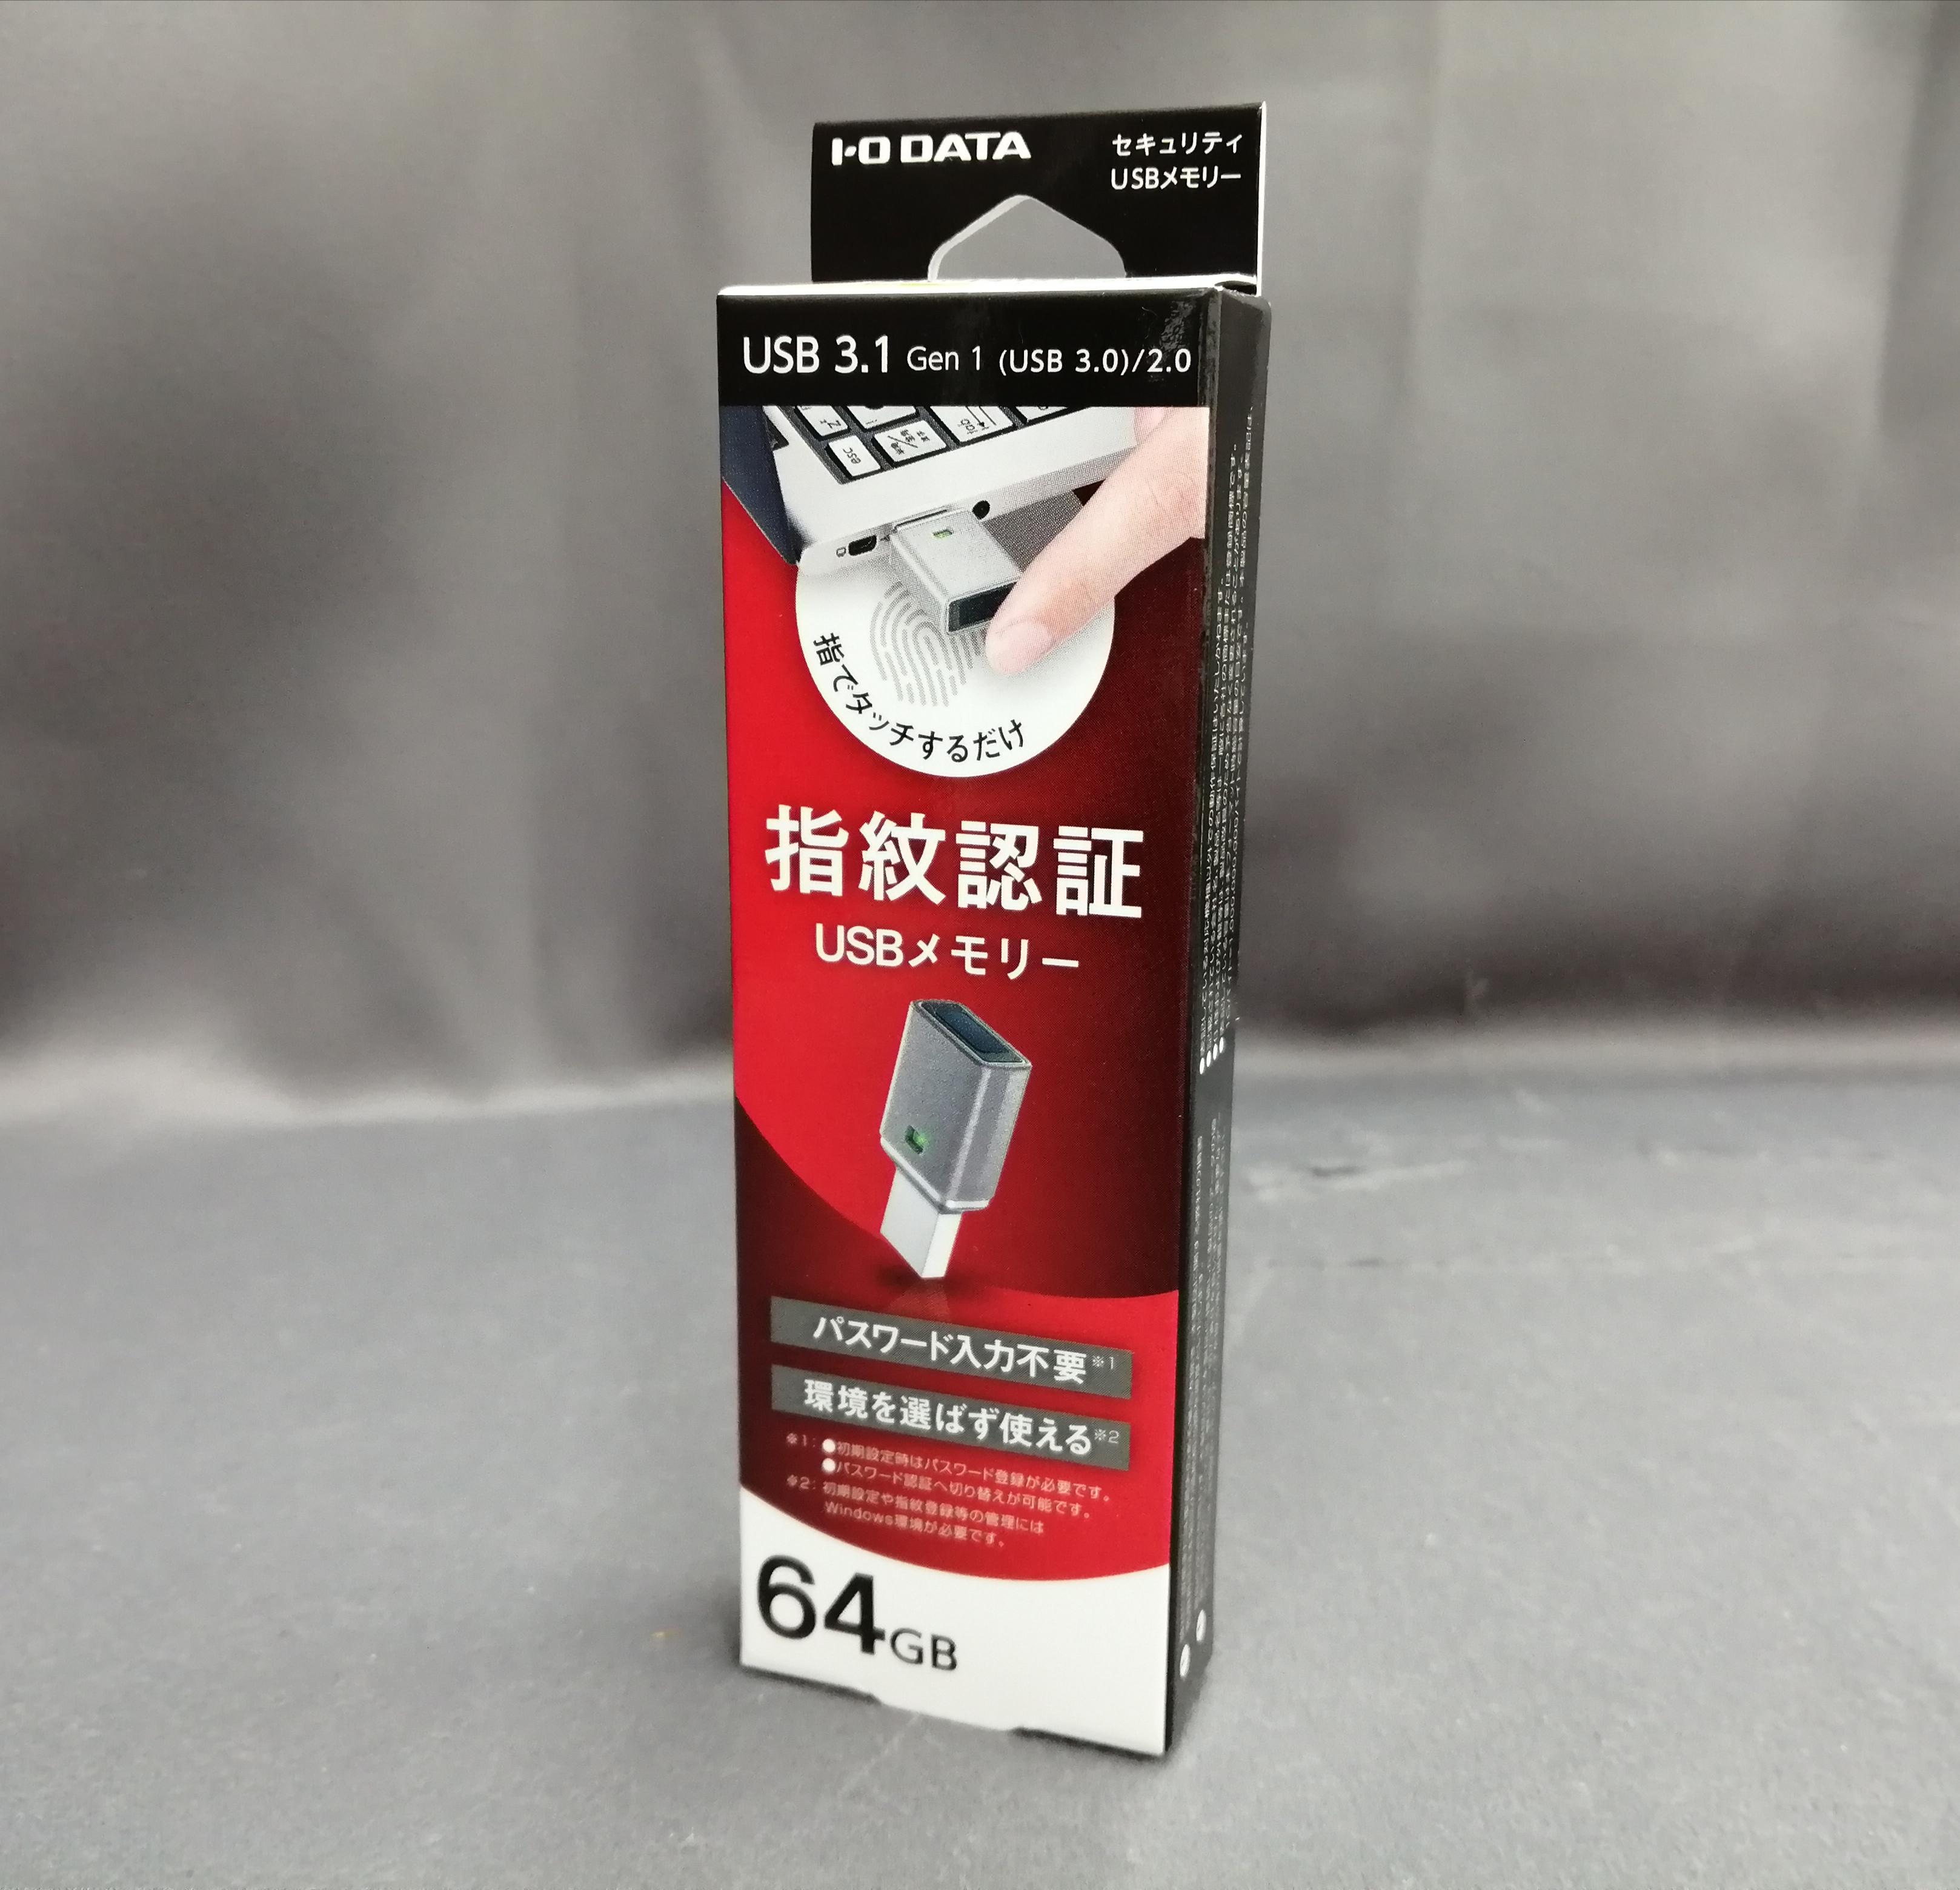 USBメモリー 64GB|IODATA